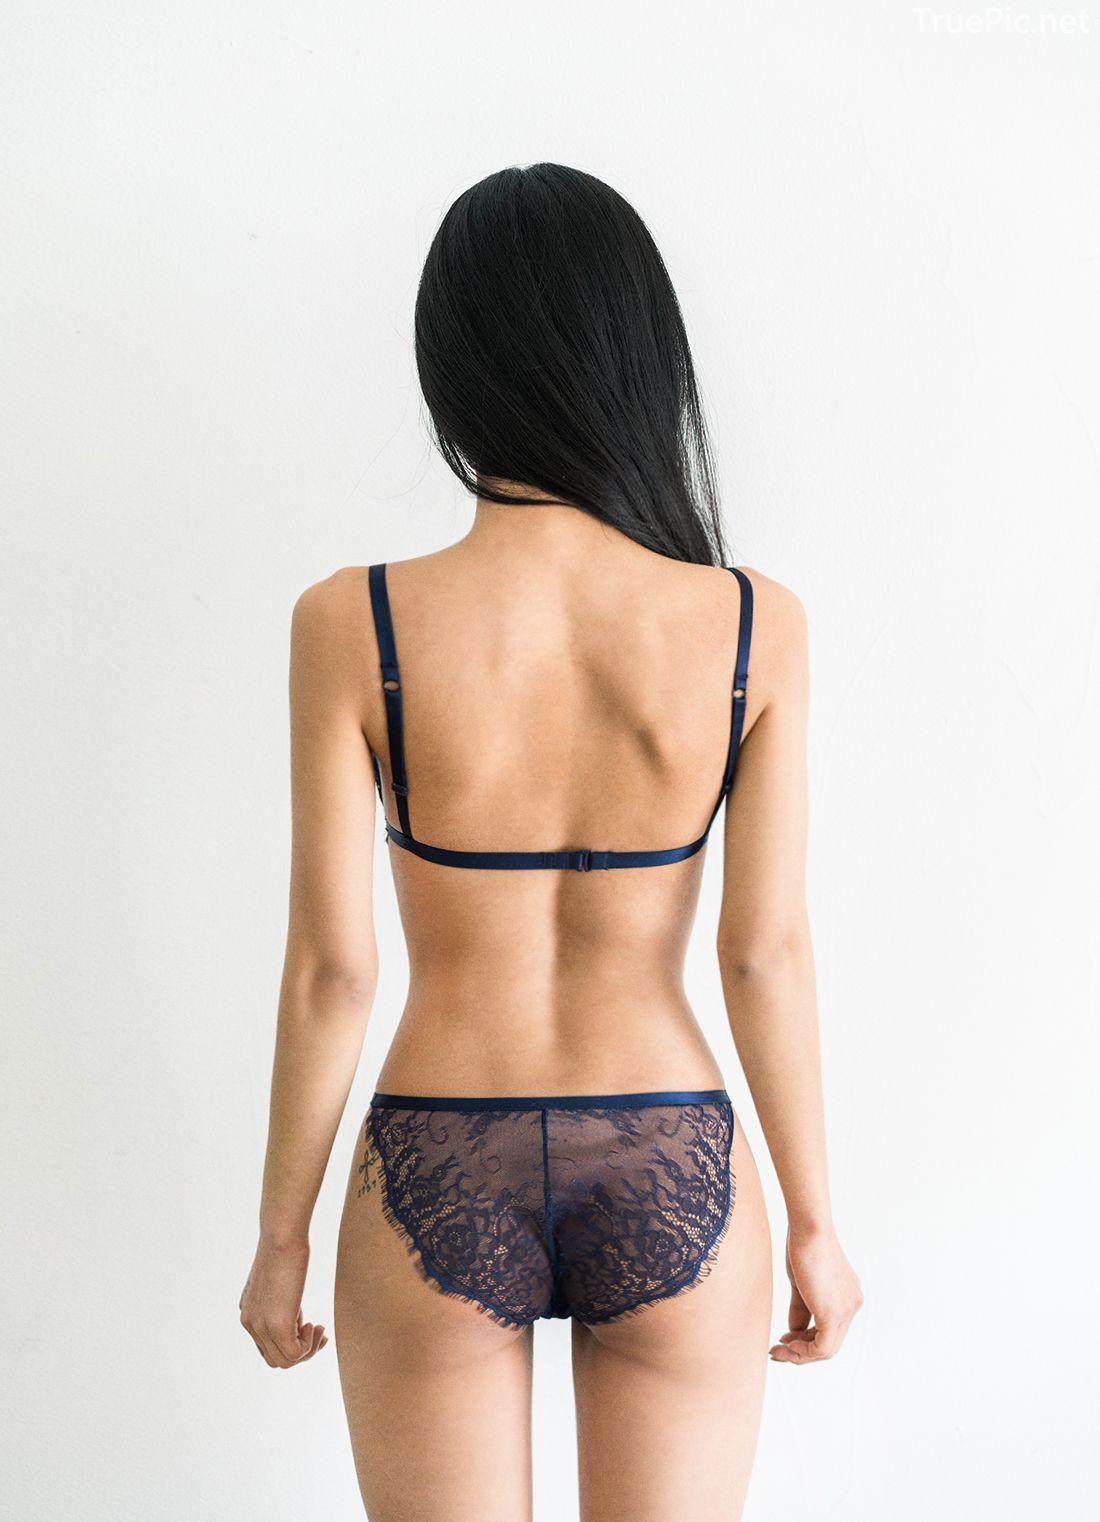 Korean Fashion Model - Baek Ye Jin - Sexy Lingerie Collection - TruePic.net - Picture 9